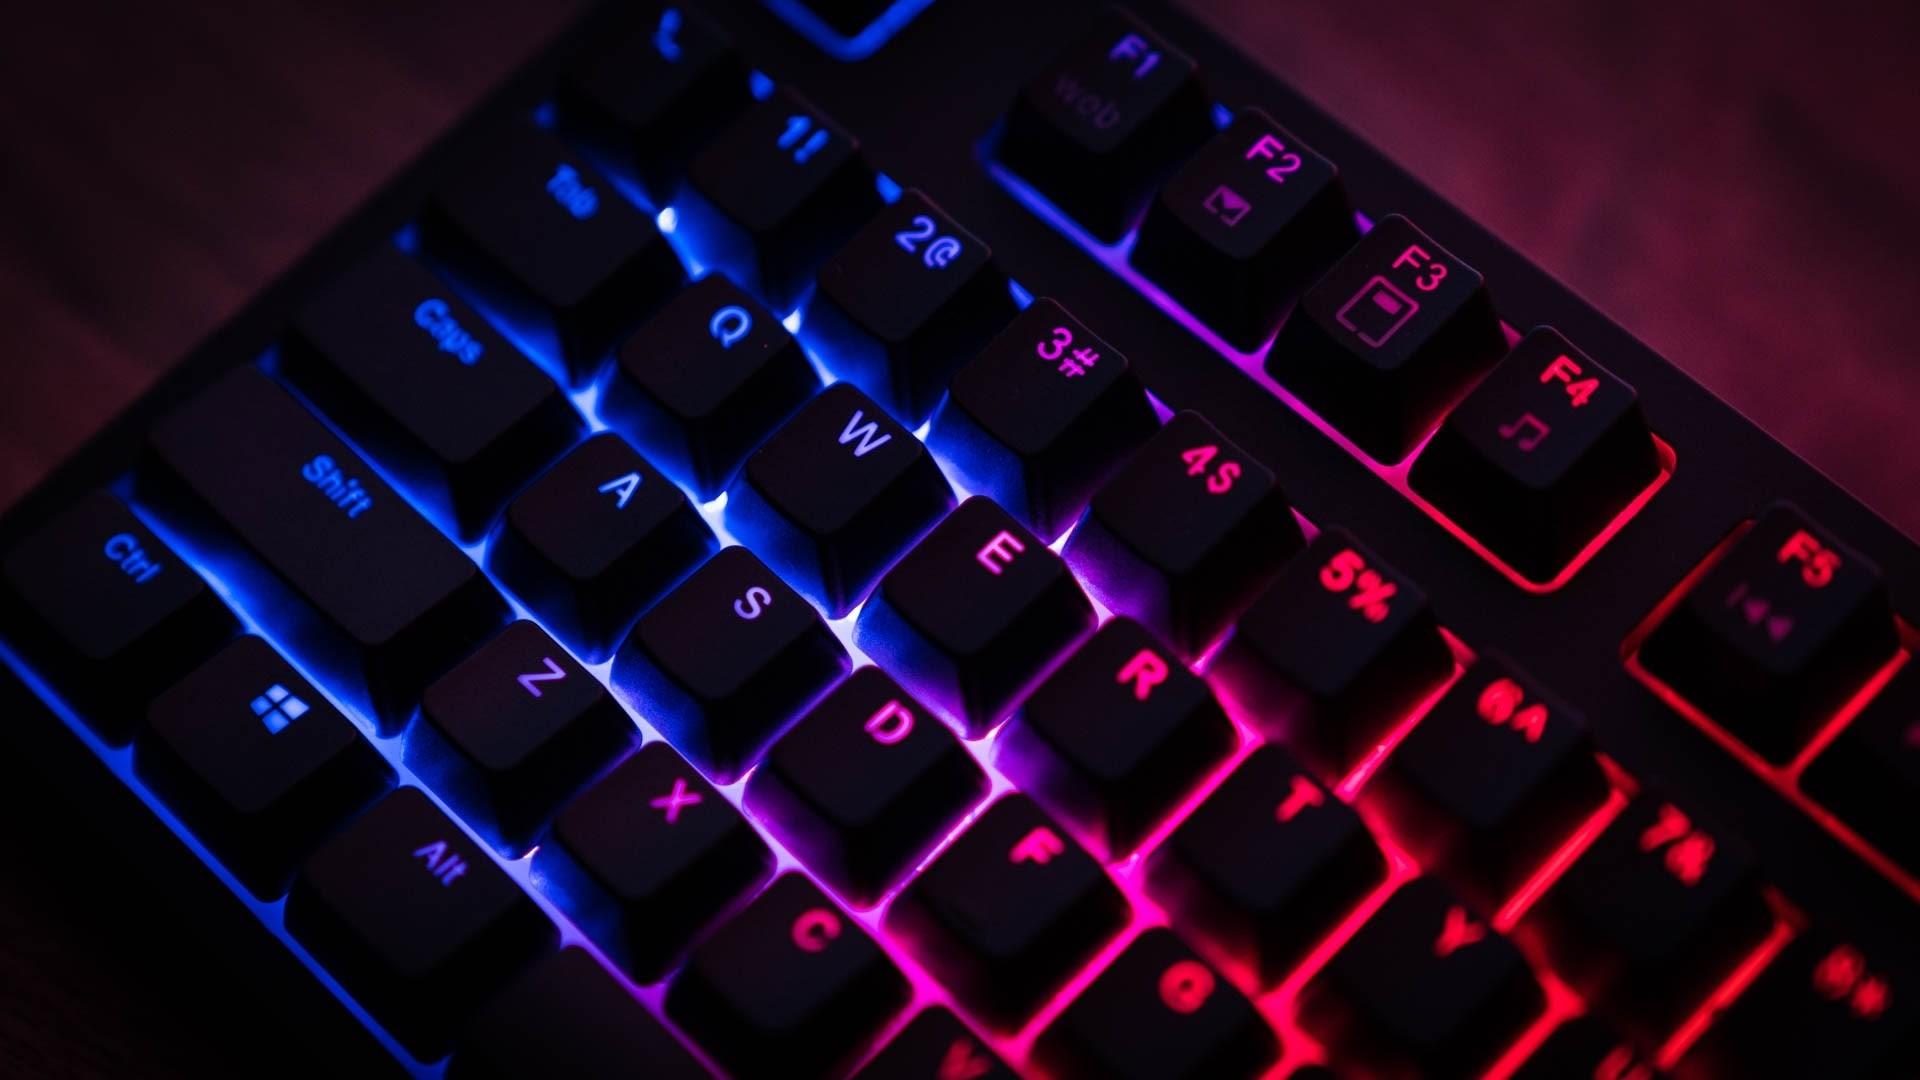 Keyboard Wallpaper for pc